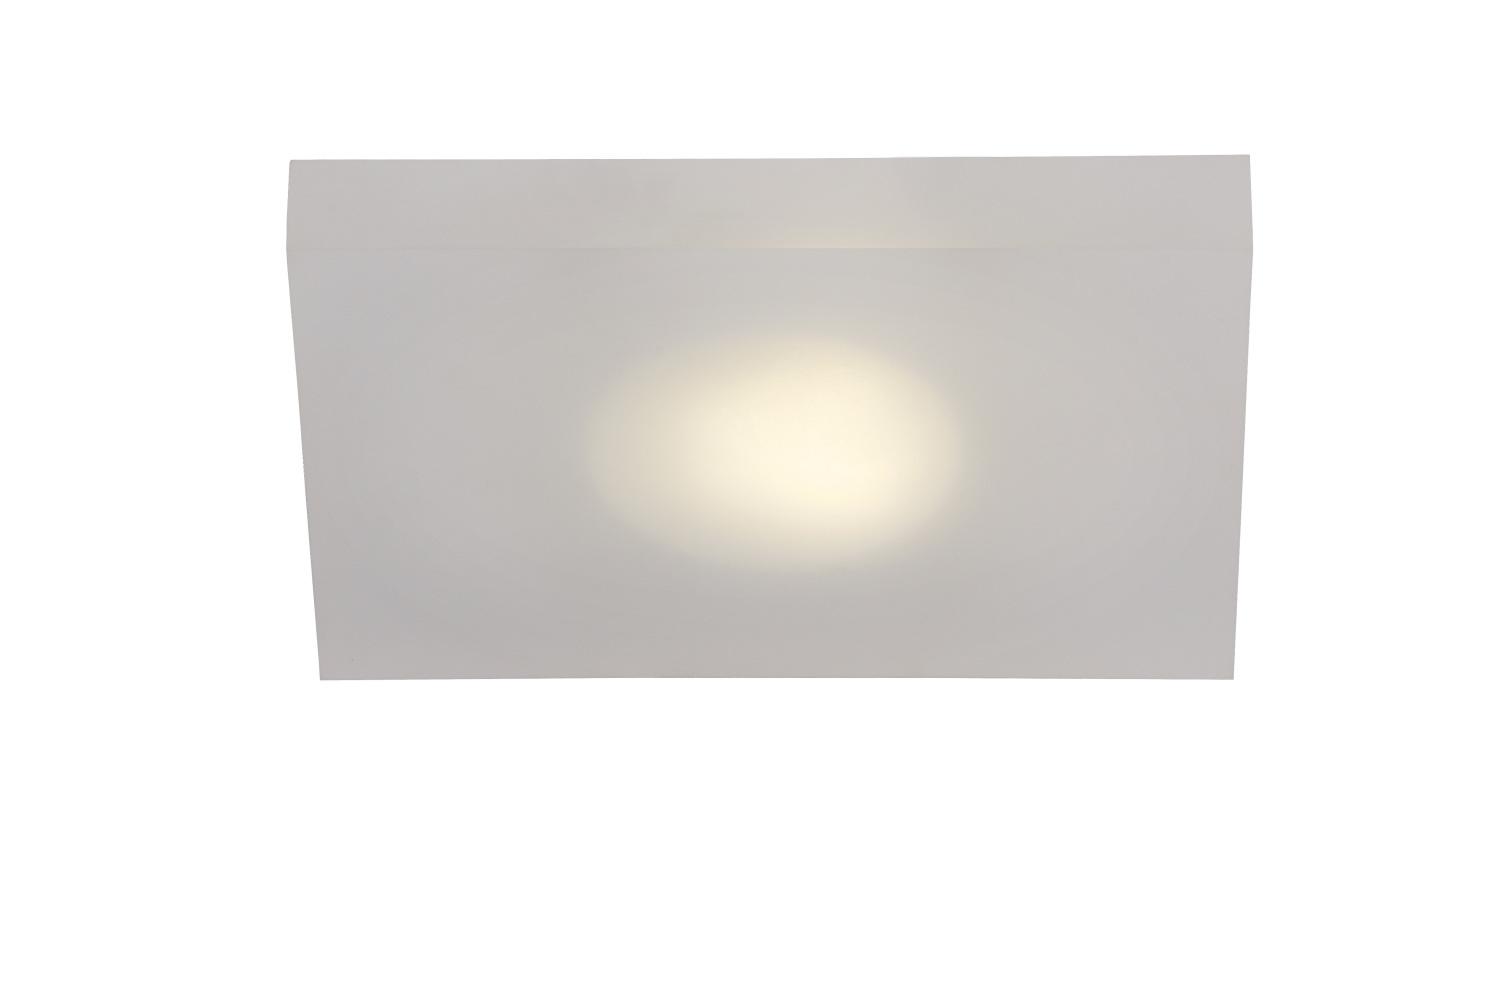 Lucide WINX-LED Plafonni�re GX53/7W 6/15/20cm Ijsmat Acr